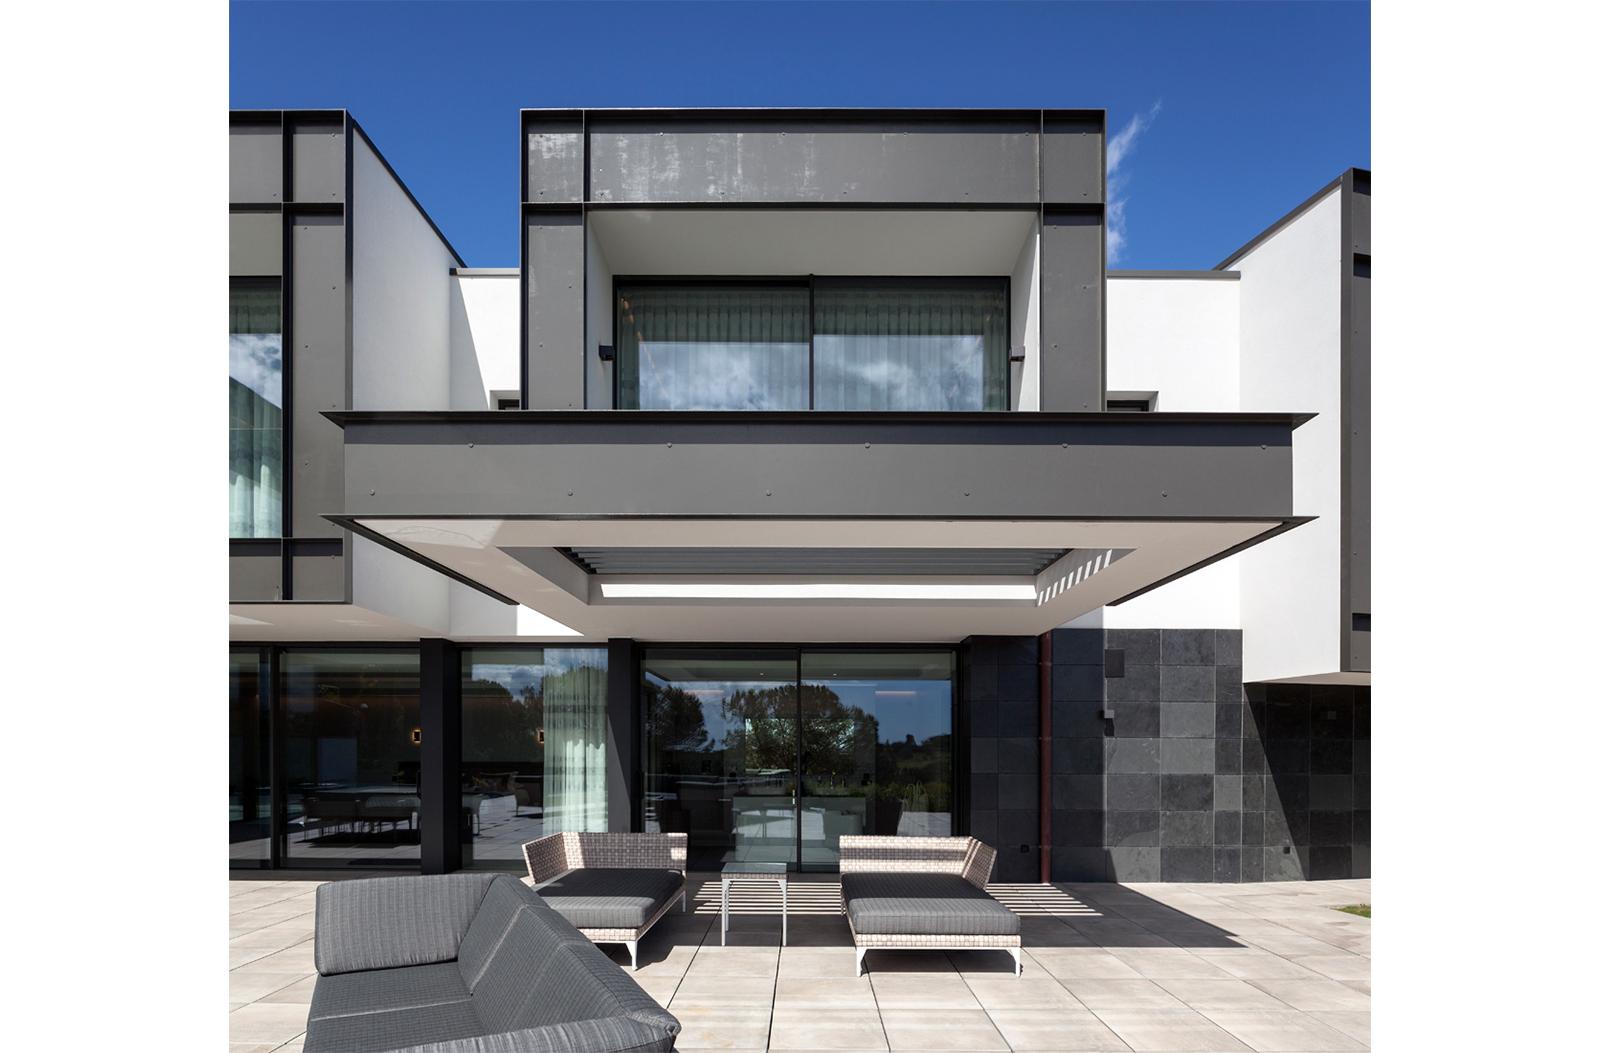 Villa-Kearney-Residential-Villa-Project-Architect-Spain-3